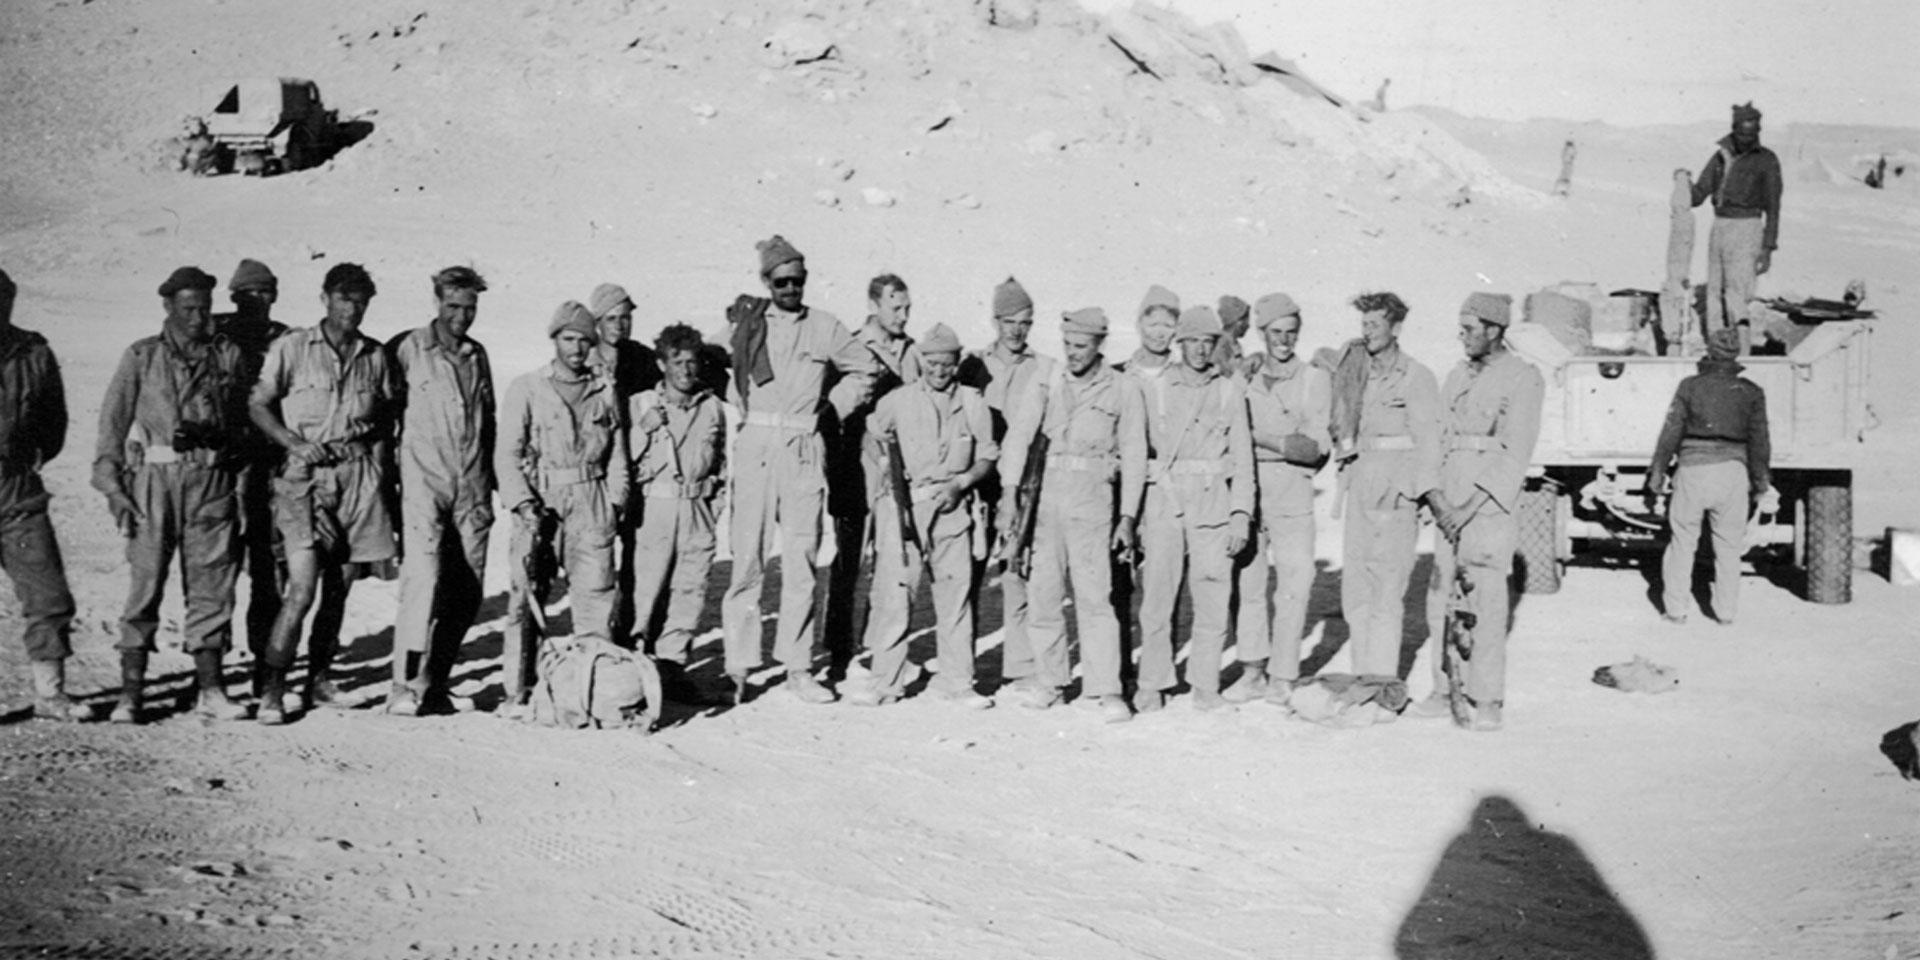 SAS survivors of Operation Squatter, November 1941